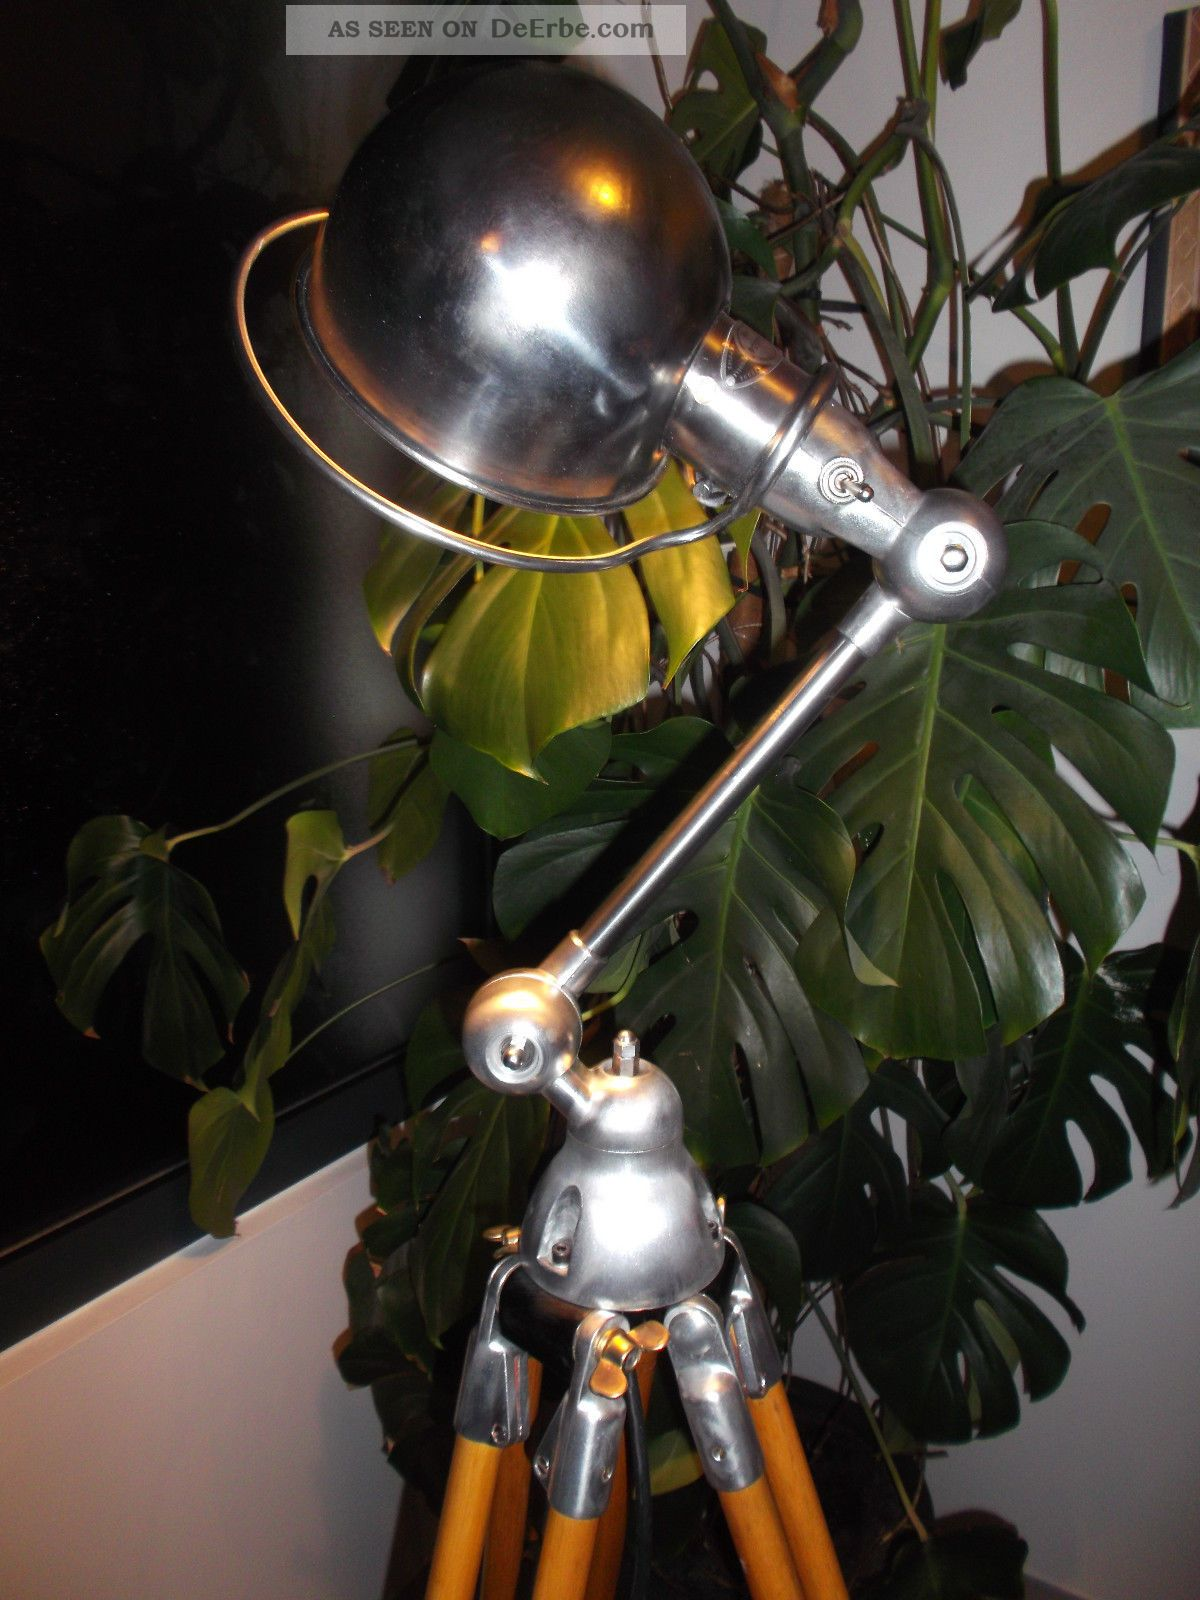 jielde tripod stehlampe stehleuchte dreibein holz stativ. Black Bedroom Furniture Sets. Home Design Ideas